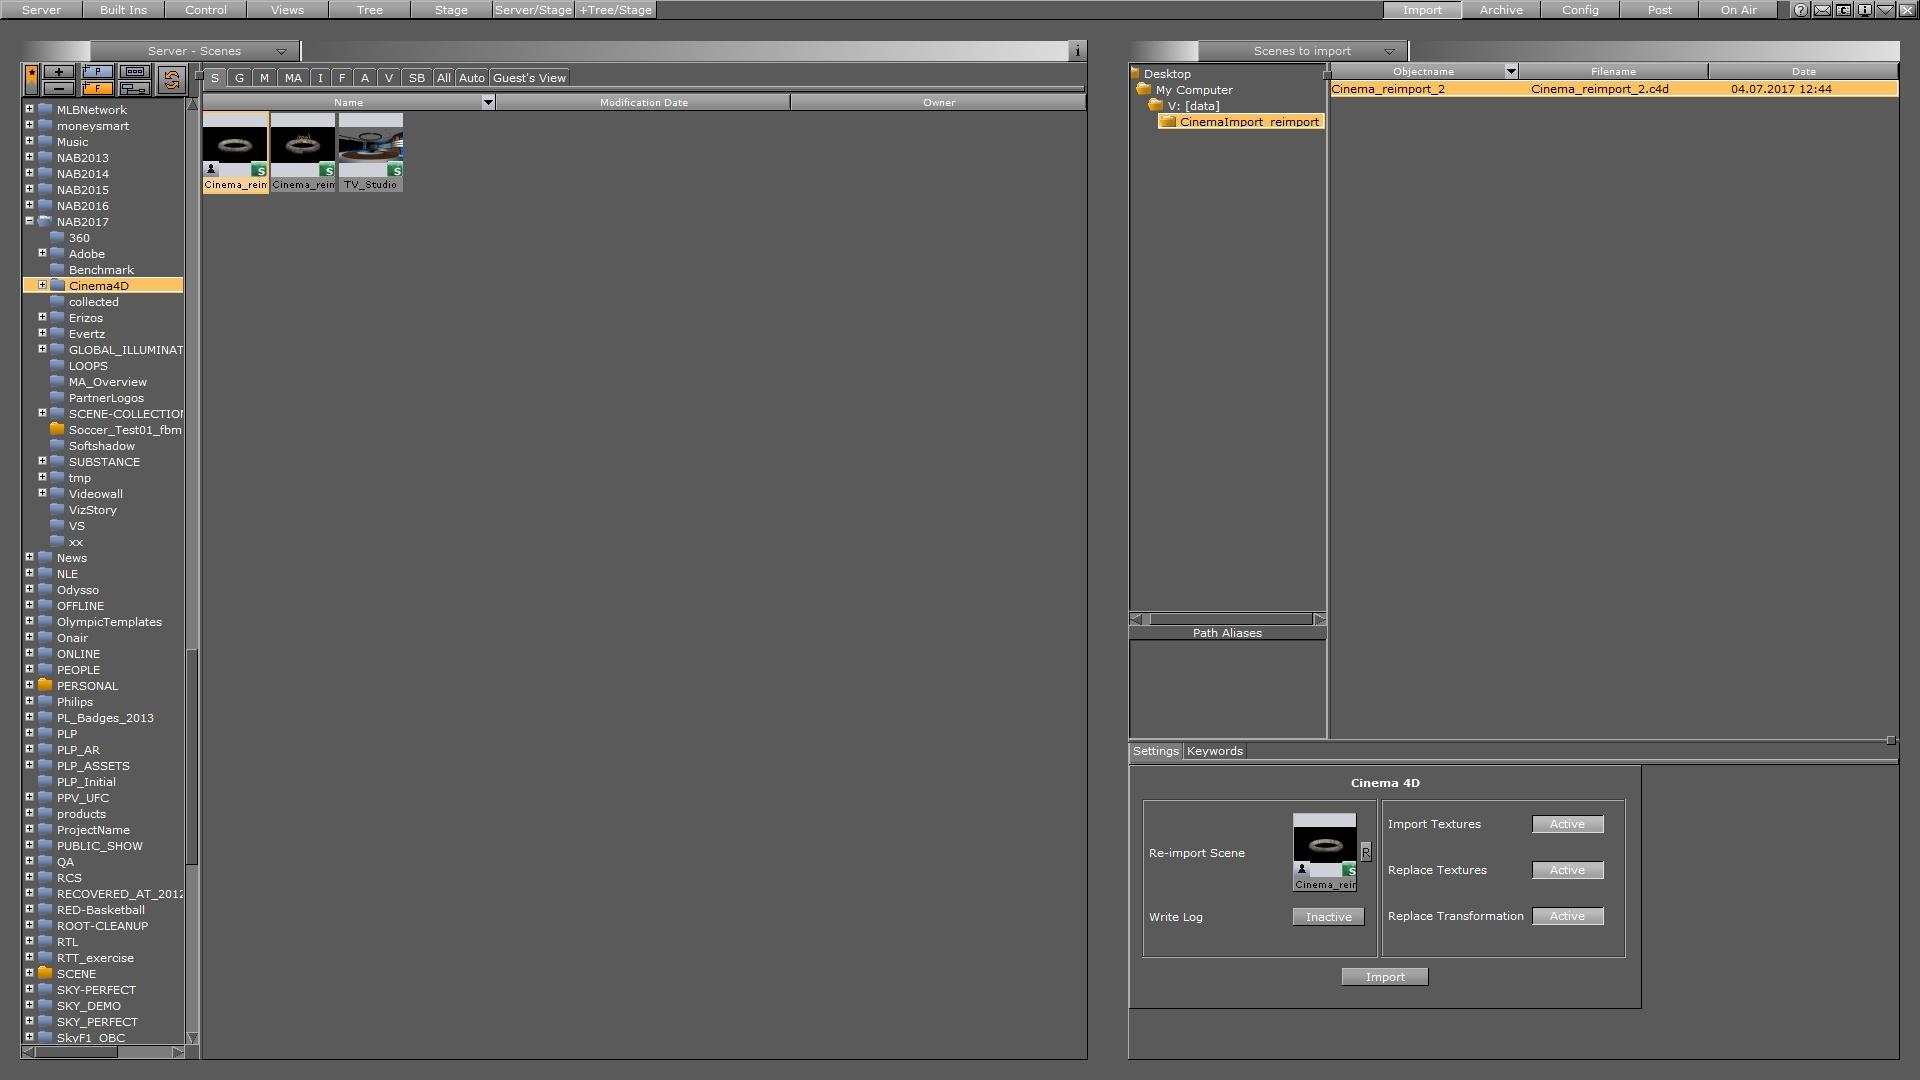 CINEMA 4D - Viz Artist and Engine